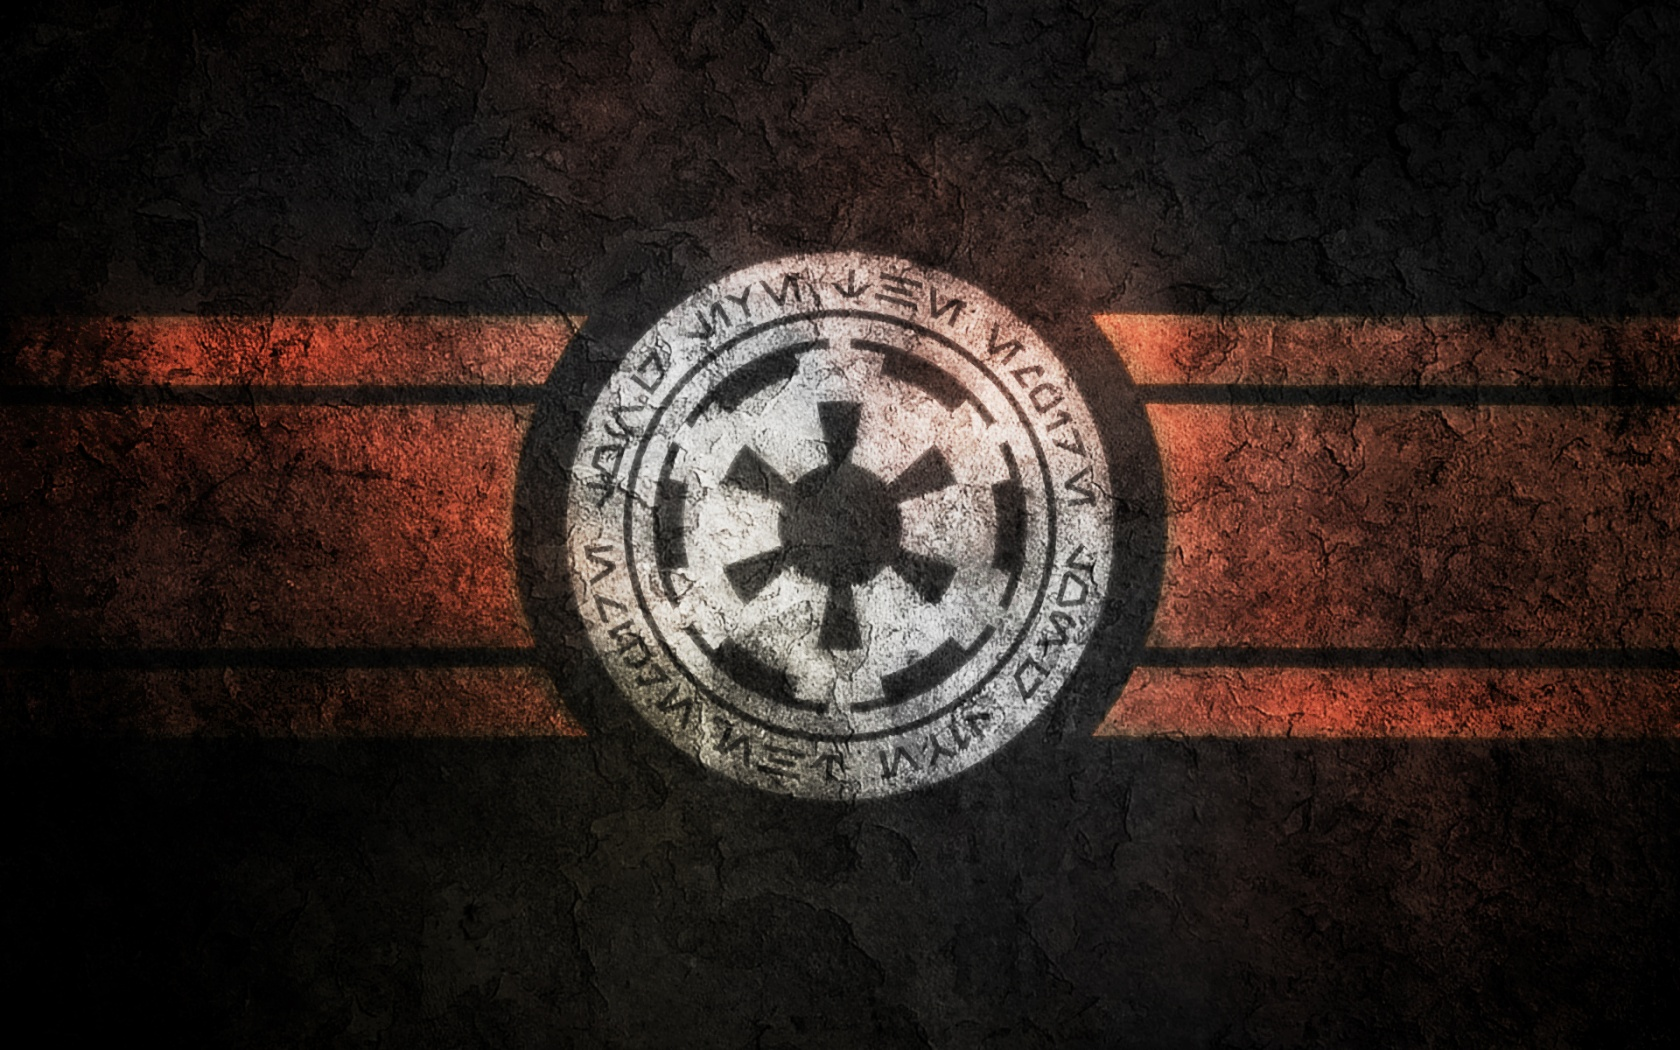 Star Wars logos Galactic Empire hd wallpaper background   HD 1680x1050